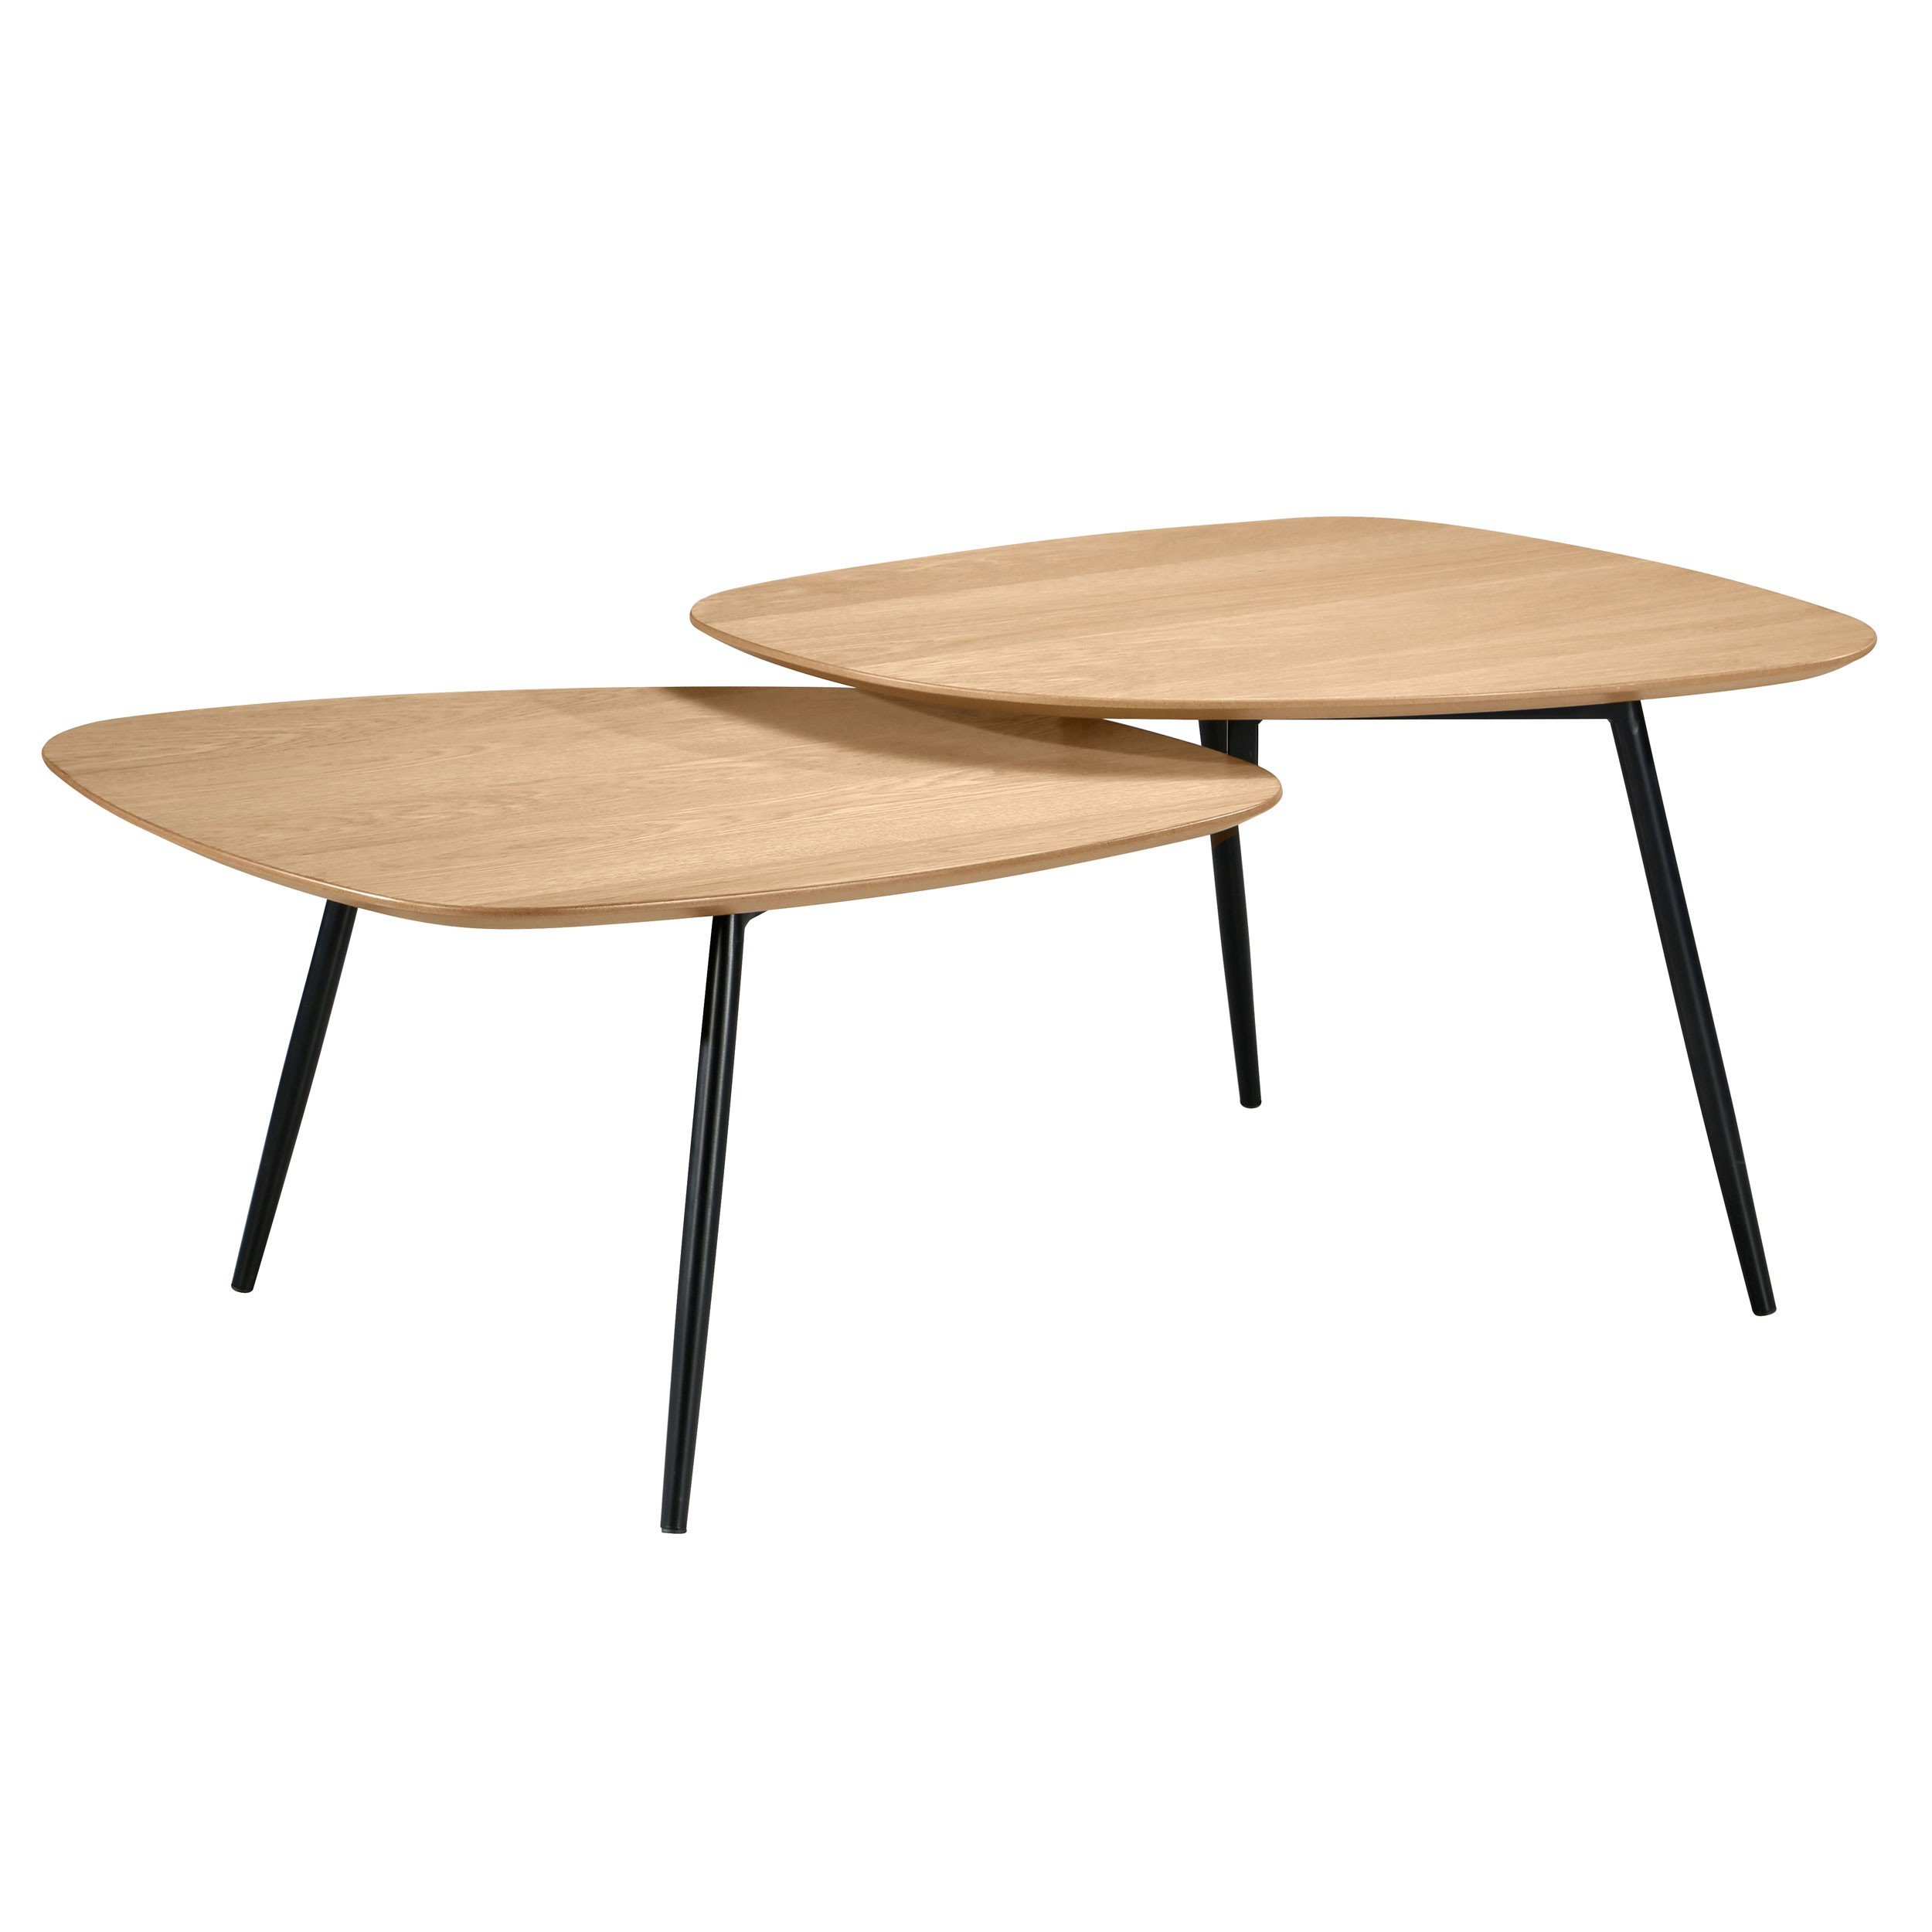 Table Basse Bois Scandinave.Table Basse Loken